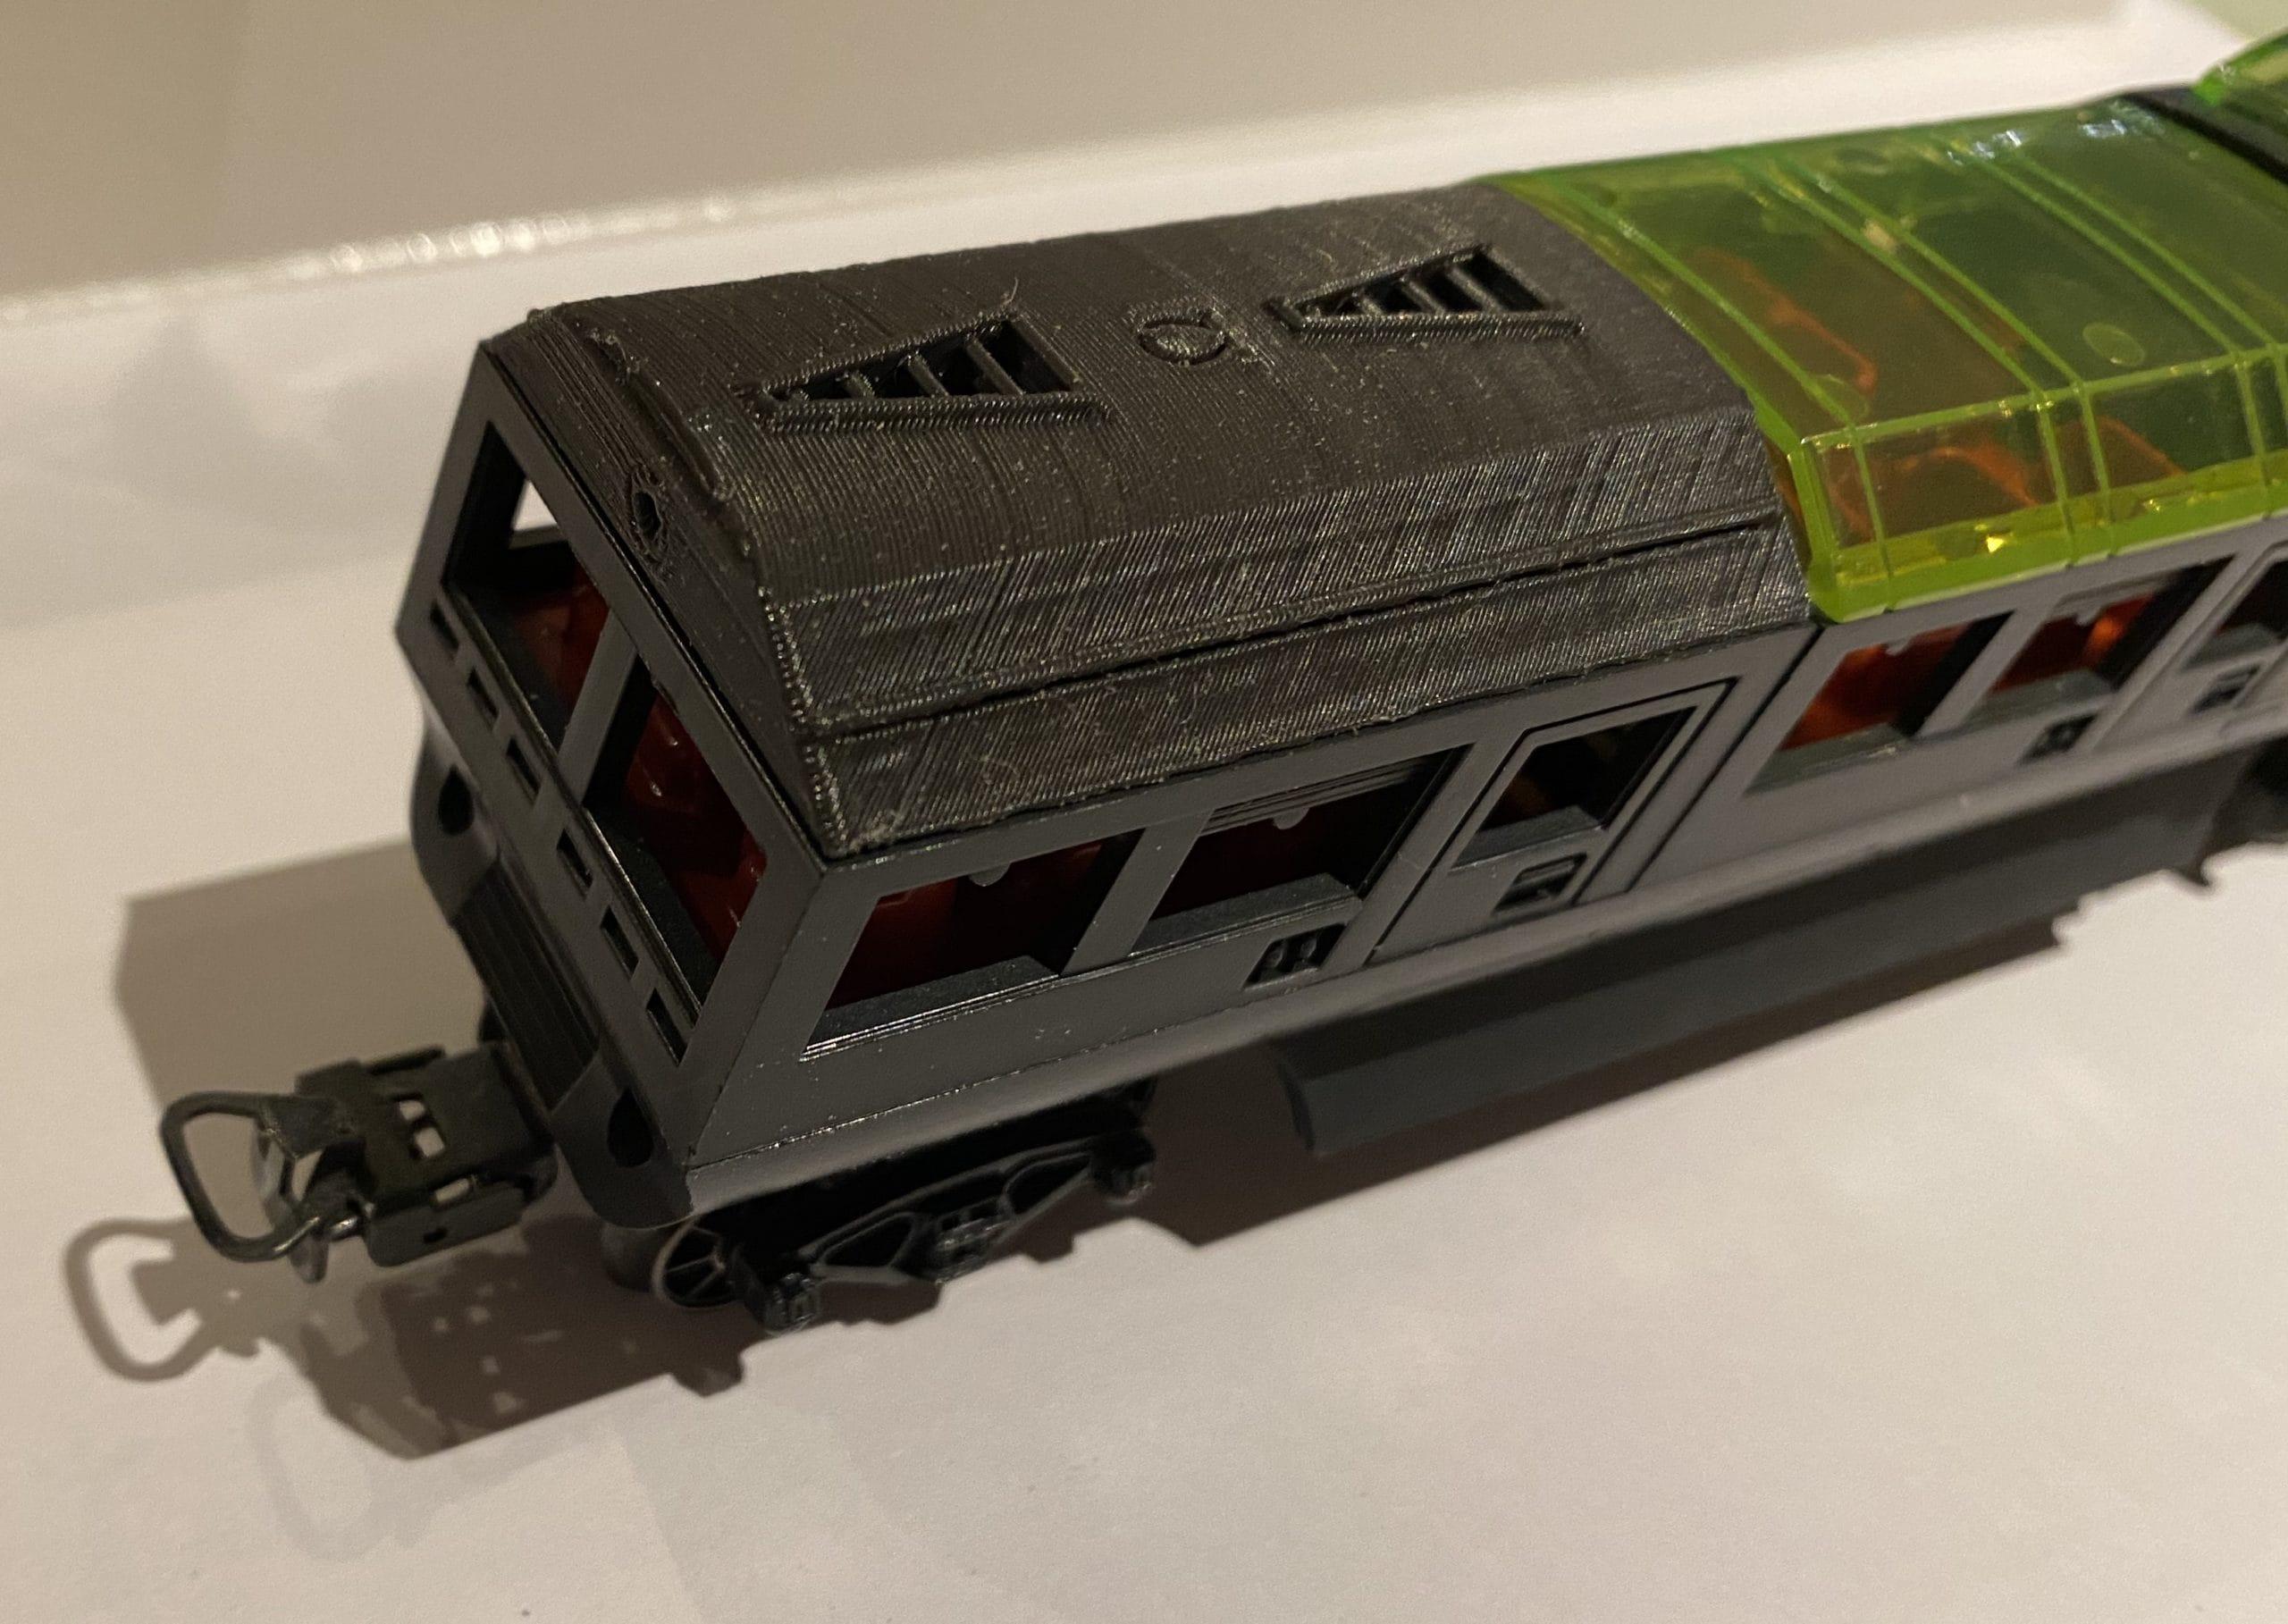 Wagon Märklin α avec un couvercle Ω